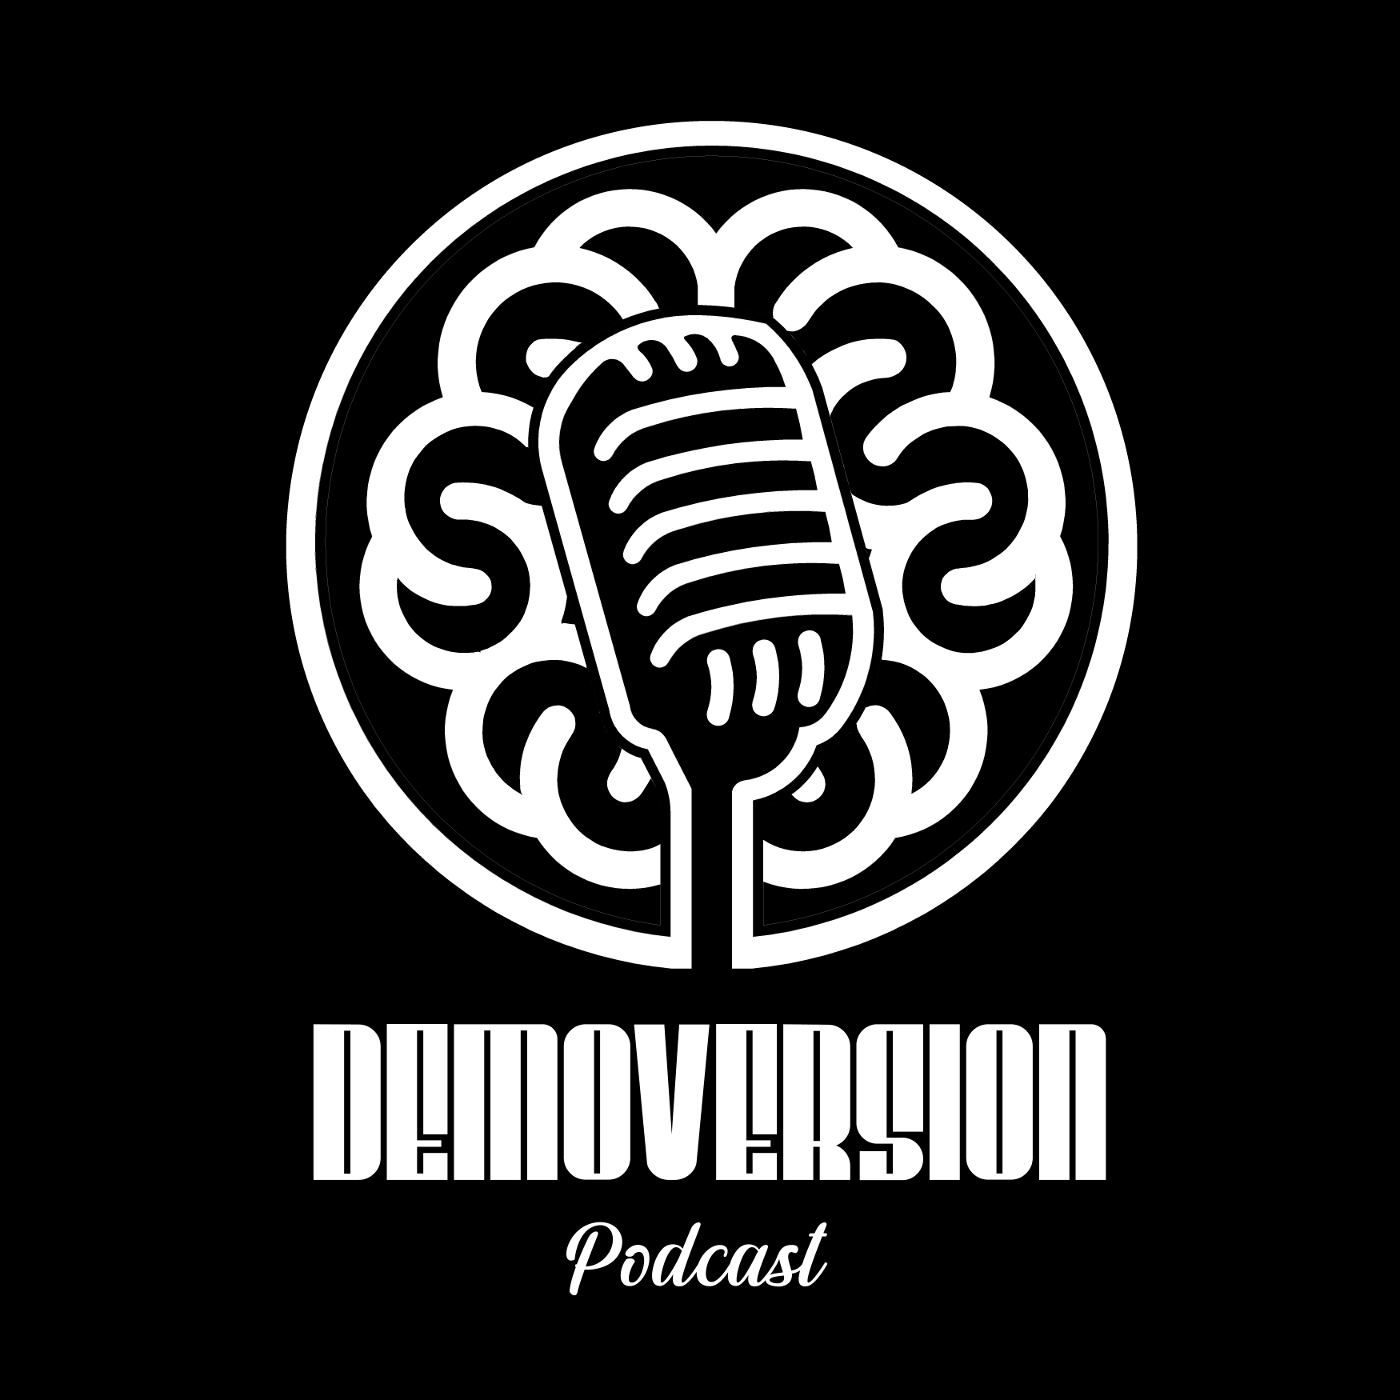 DemoVersion Podcast پادکست دموورژن